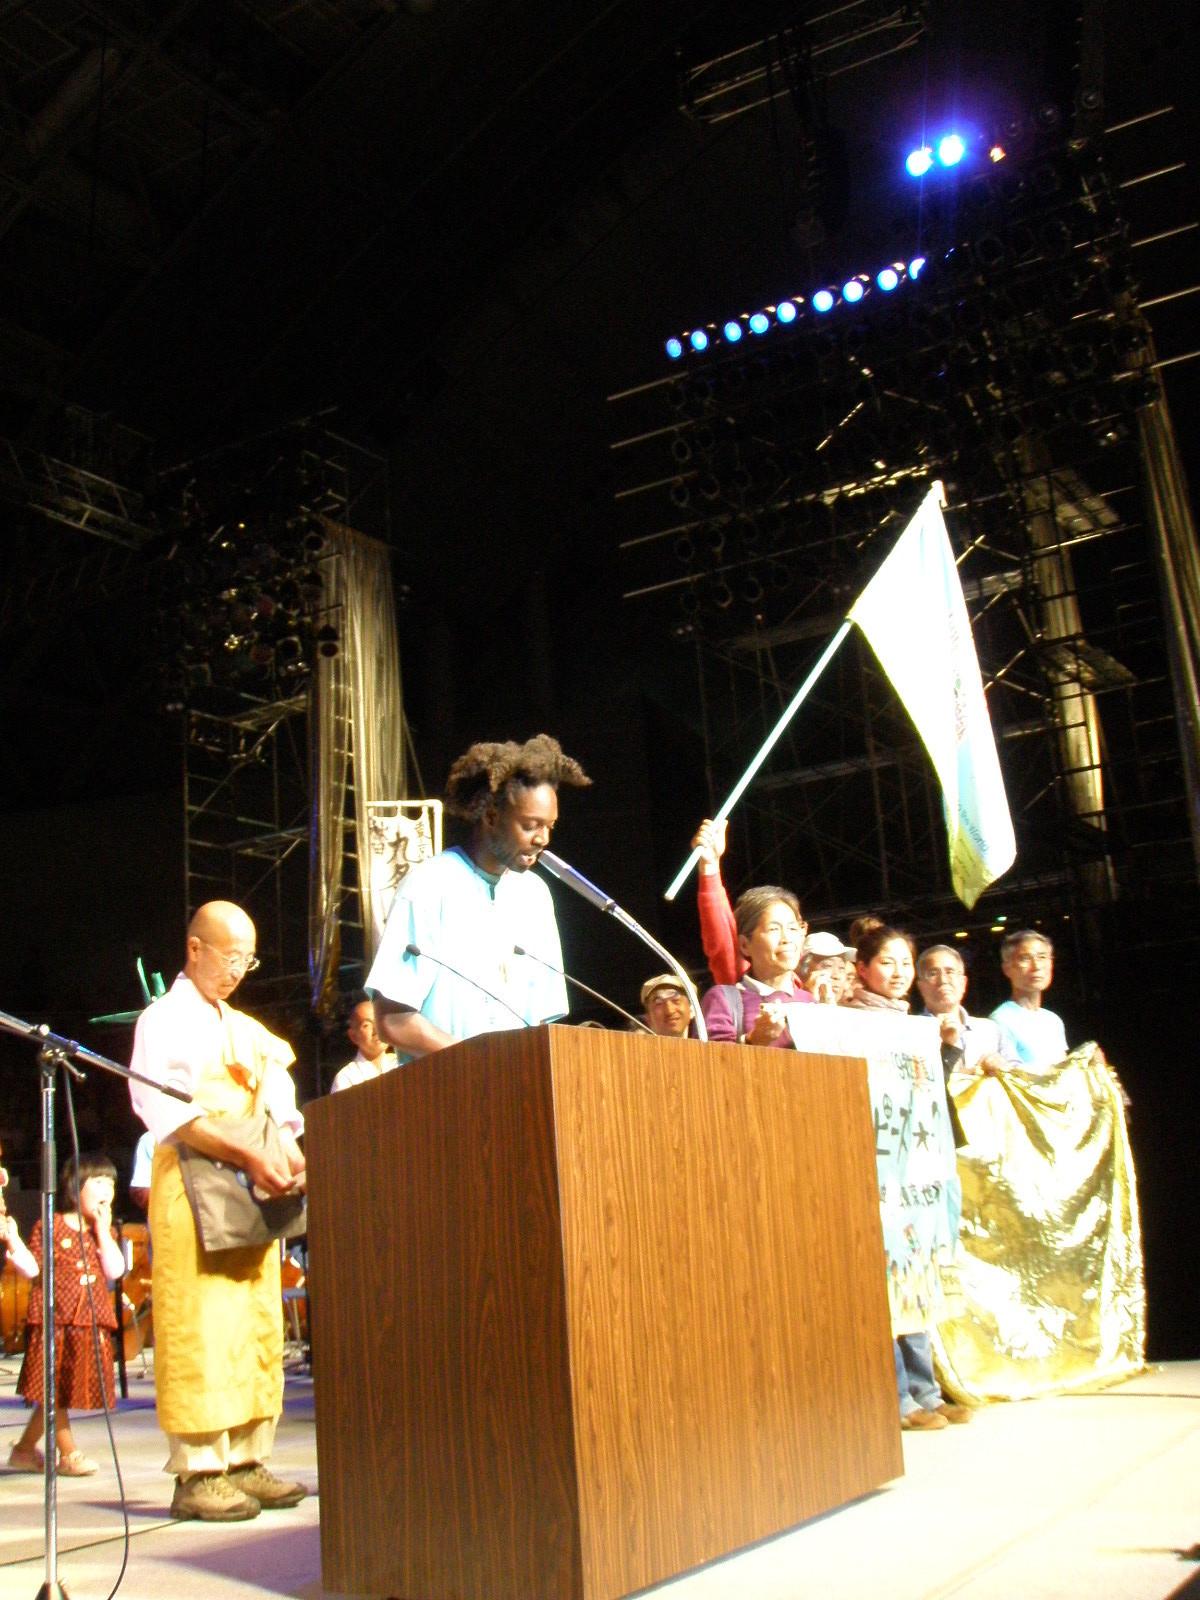 marciatori sul palco